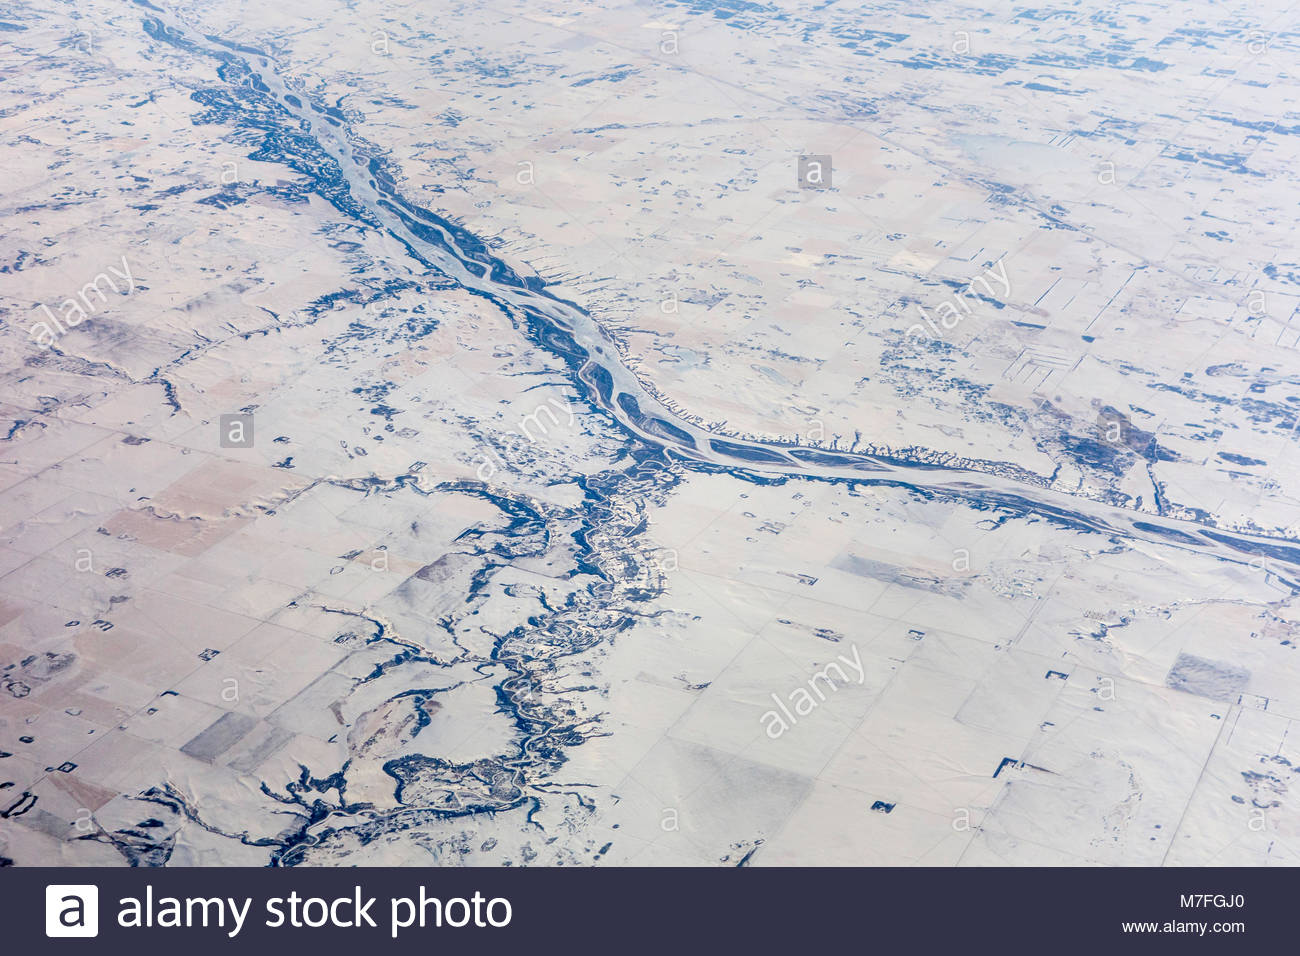 Eagle Creek (bottom) joining the North Saskatchewan River (top) on the prairie near Saskatoon Saskatchewan Canada. - Stock Image